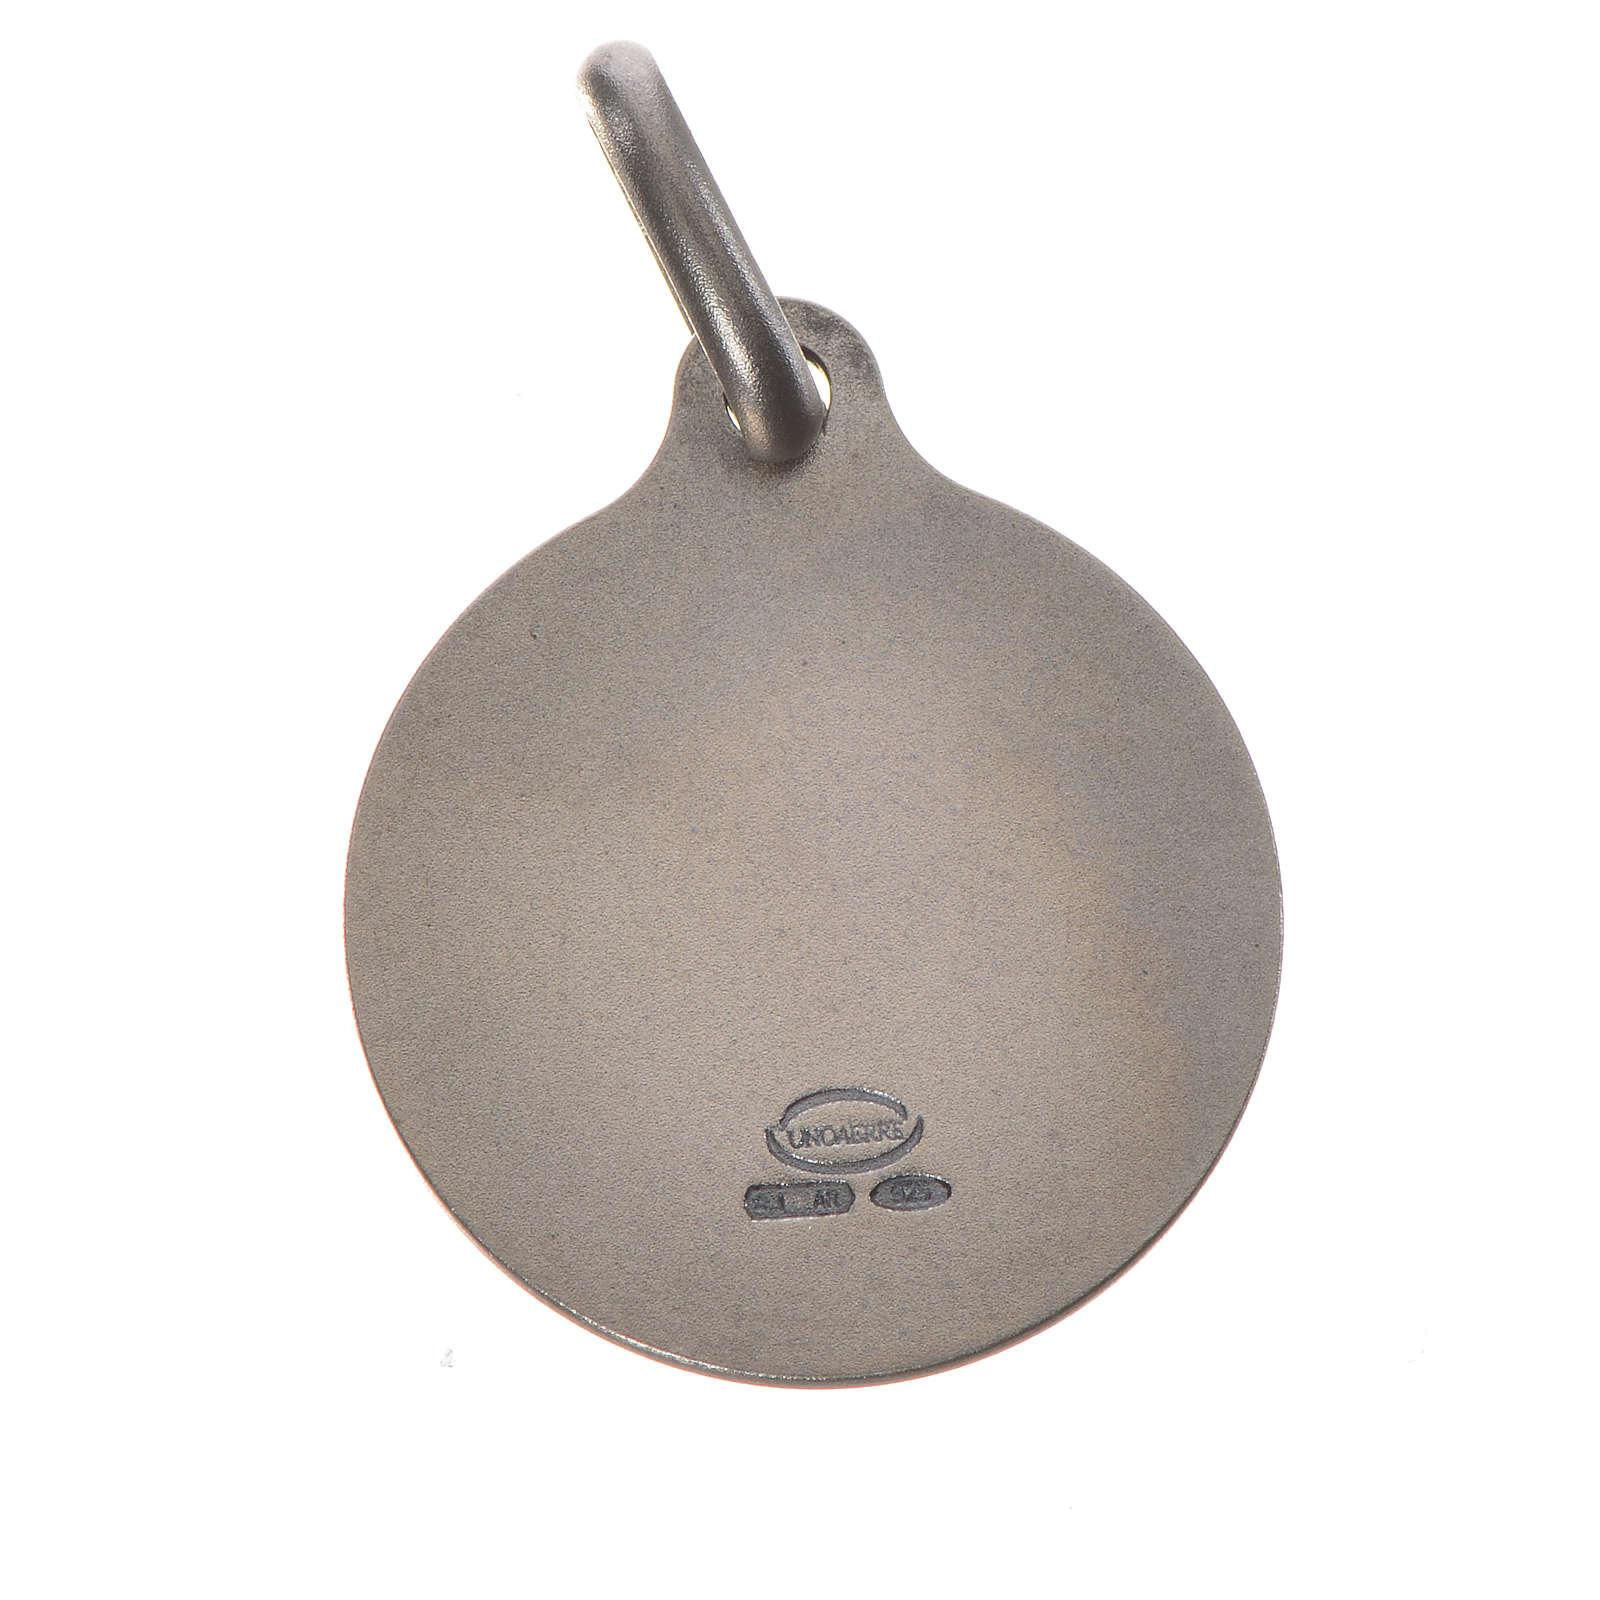 Medalla de Papa Francisco en plata 800, 18mm 4